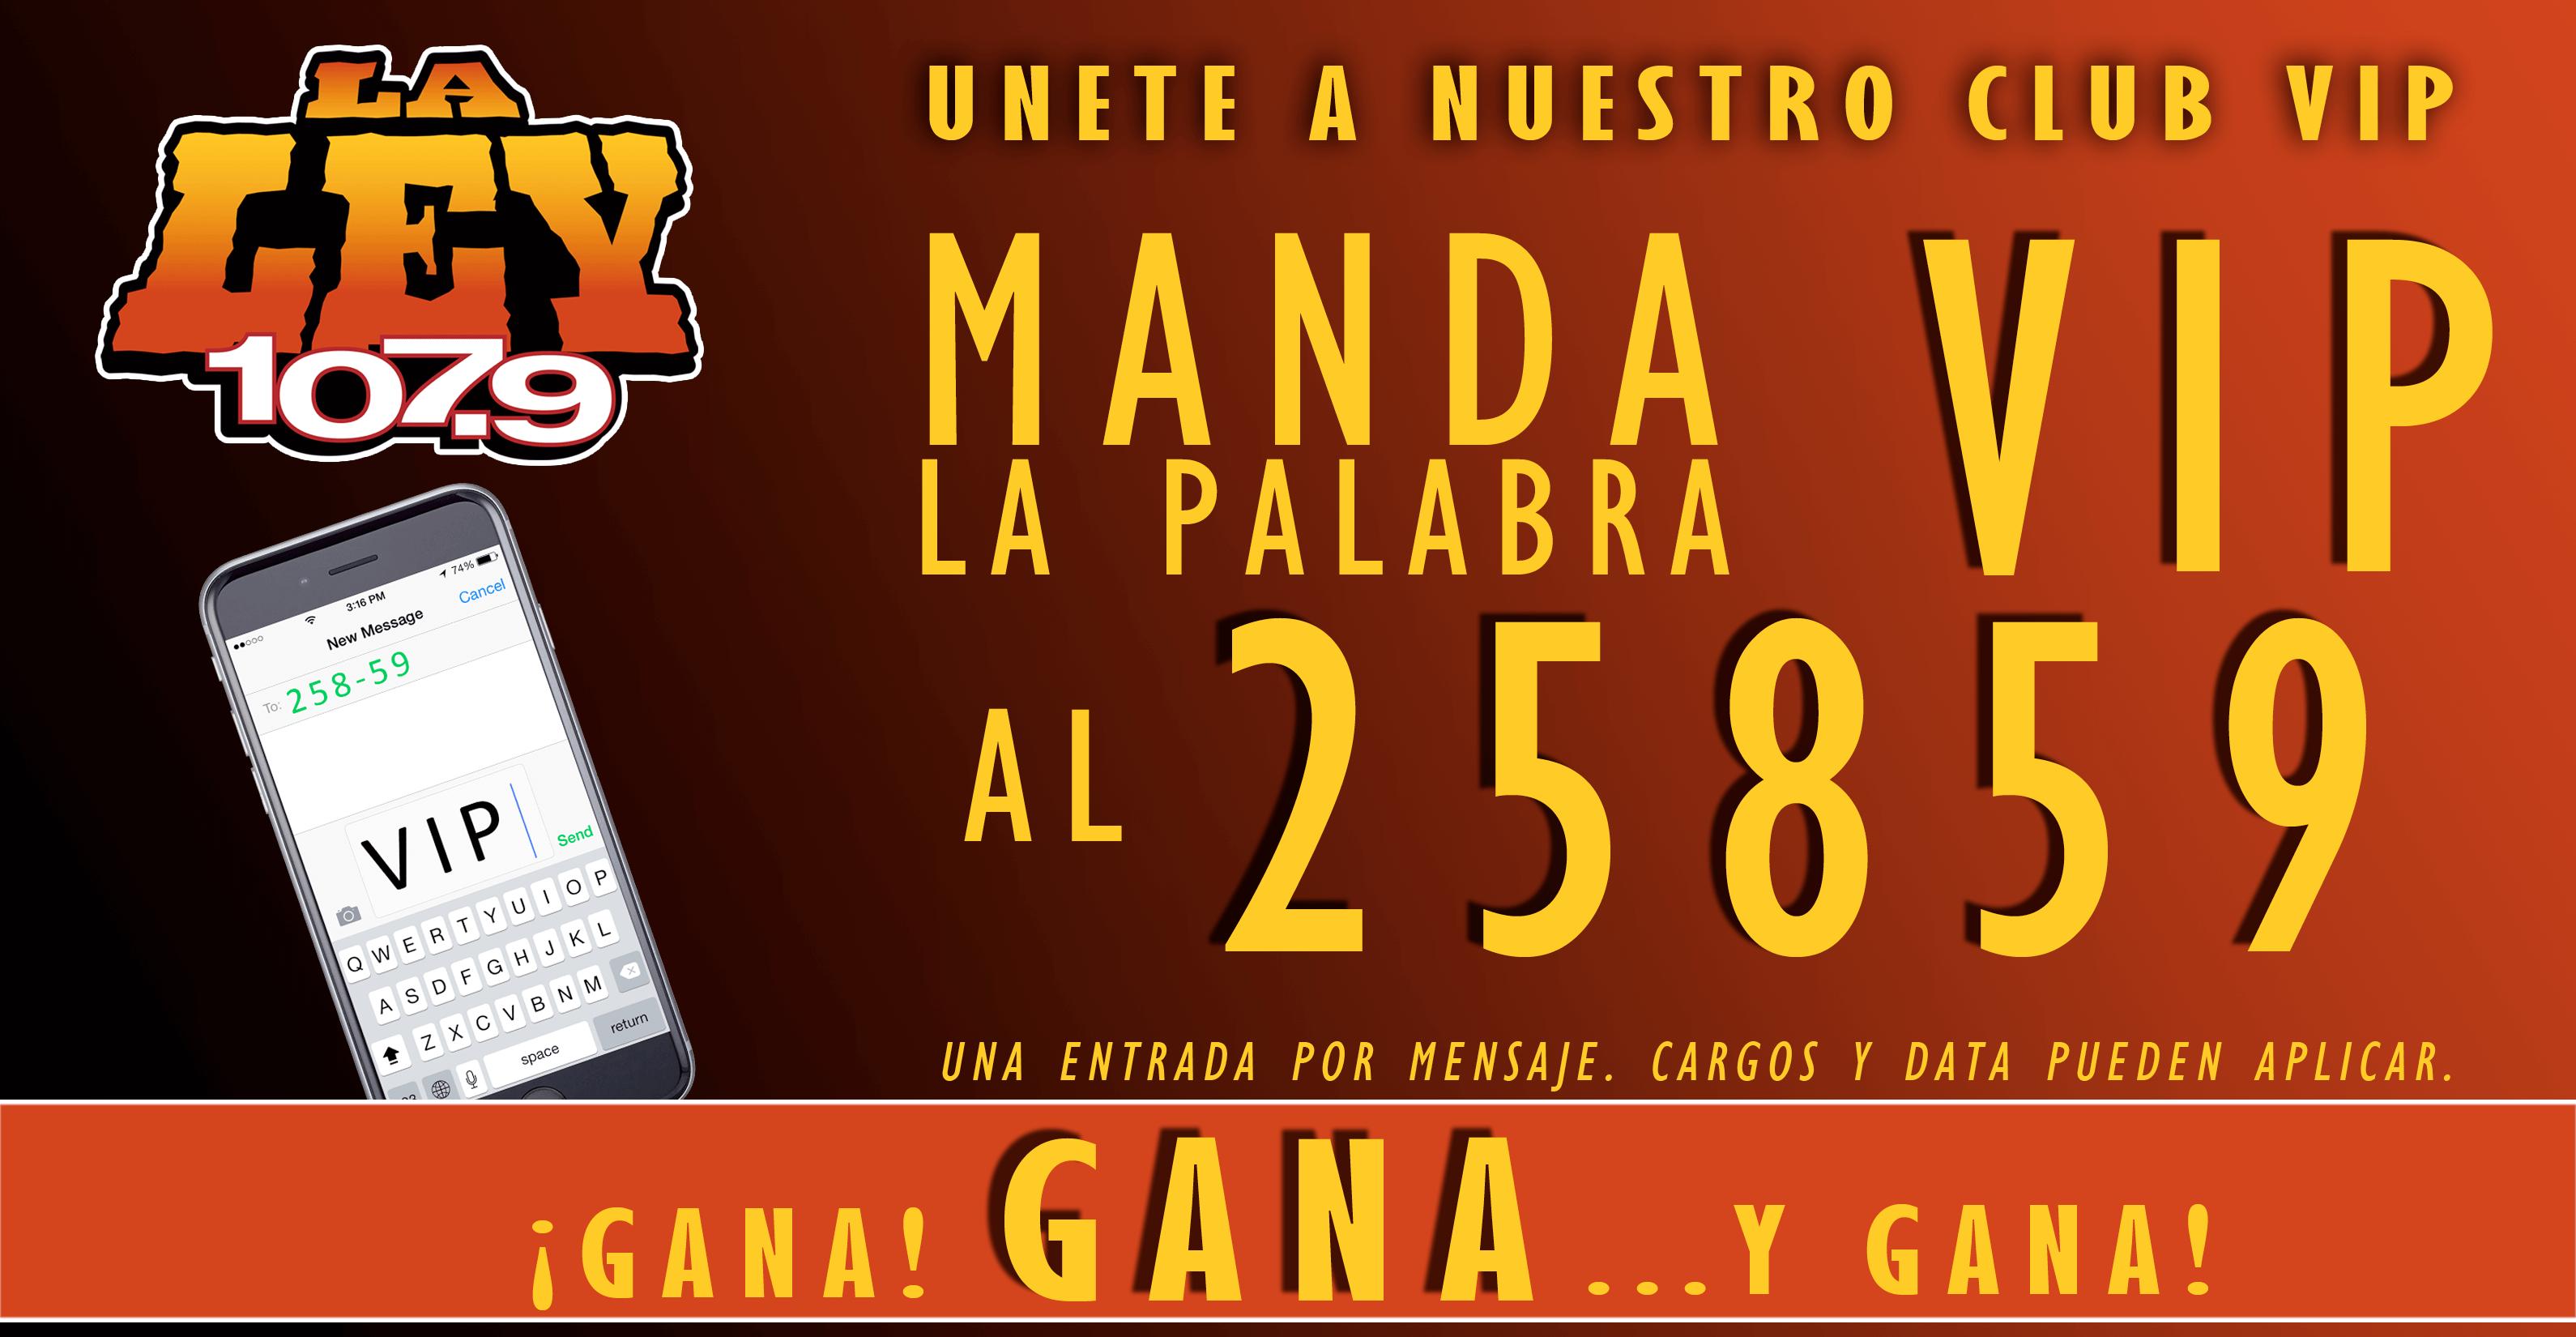 Unete a nuestro club vip hoy la ley 107 9 fm for Noticias farandula argentina hoy